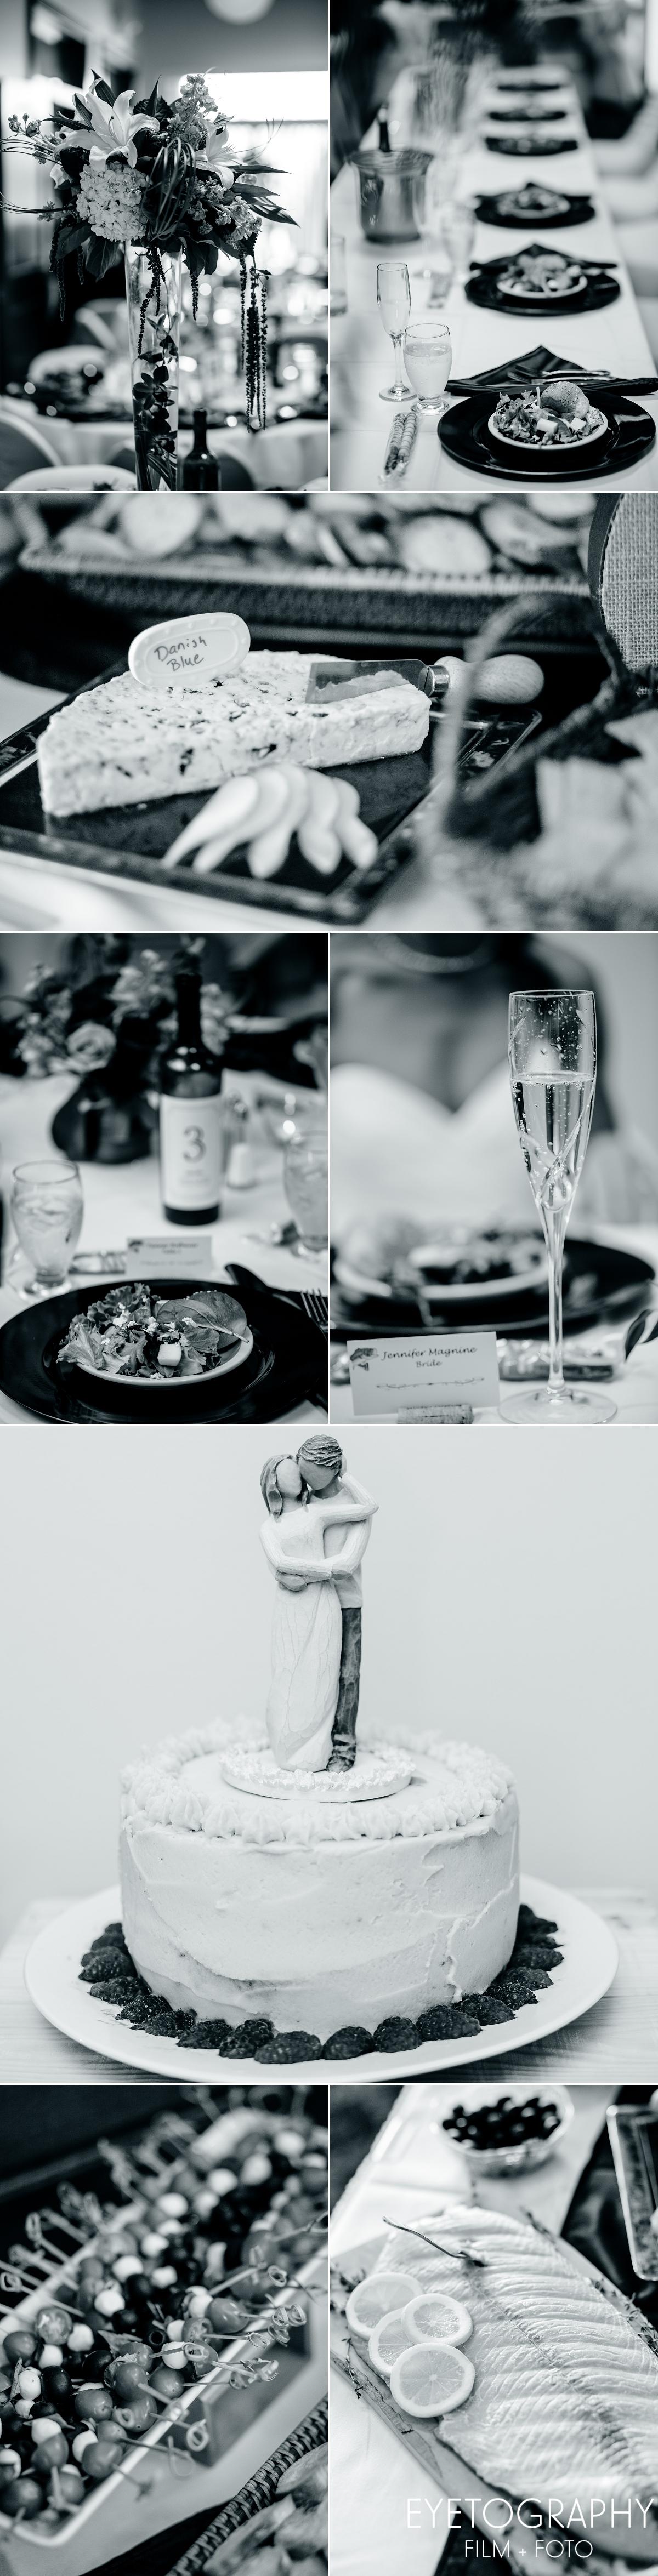 Birchwood Wisconsin Wedding Photography - Chris + Jenni - Eyetography Film + Foto 10